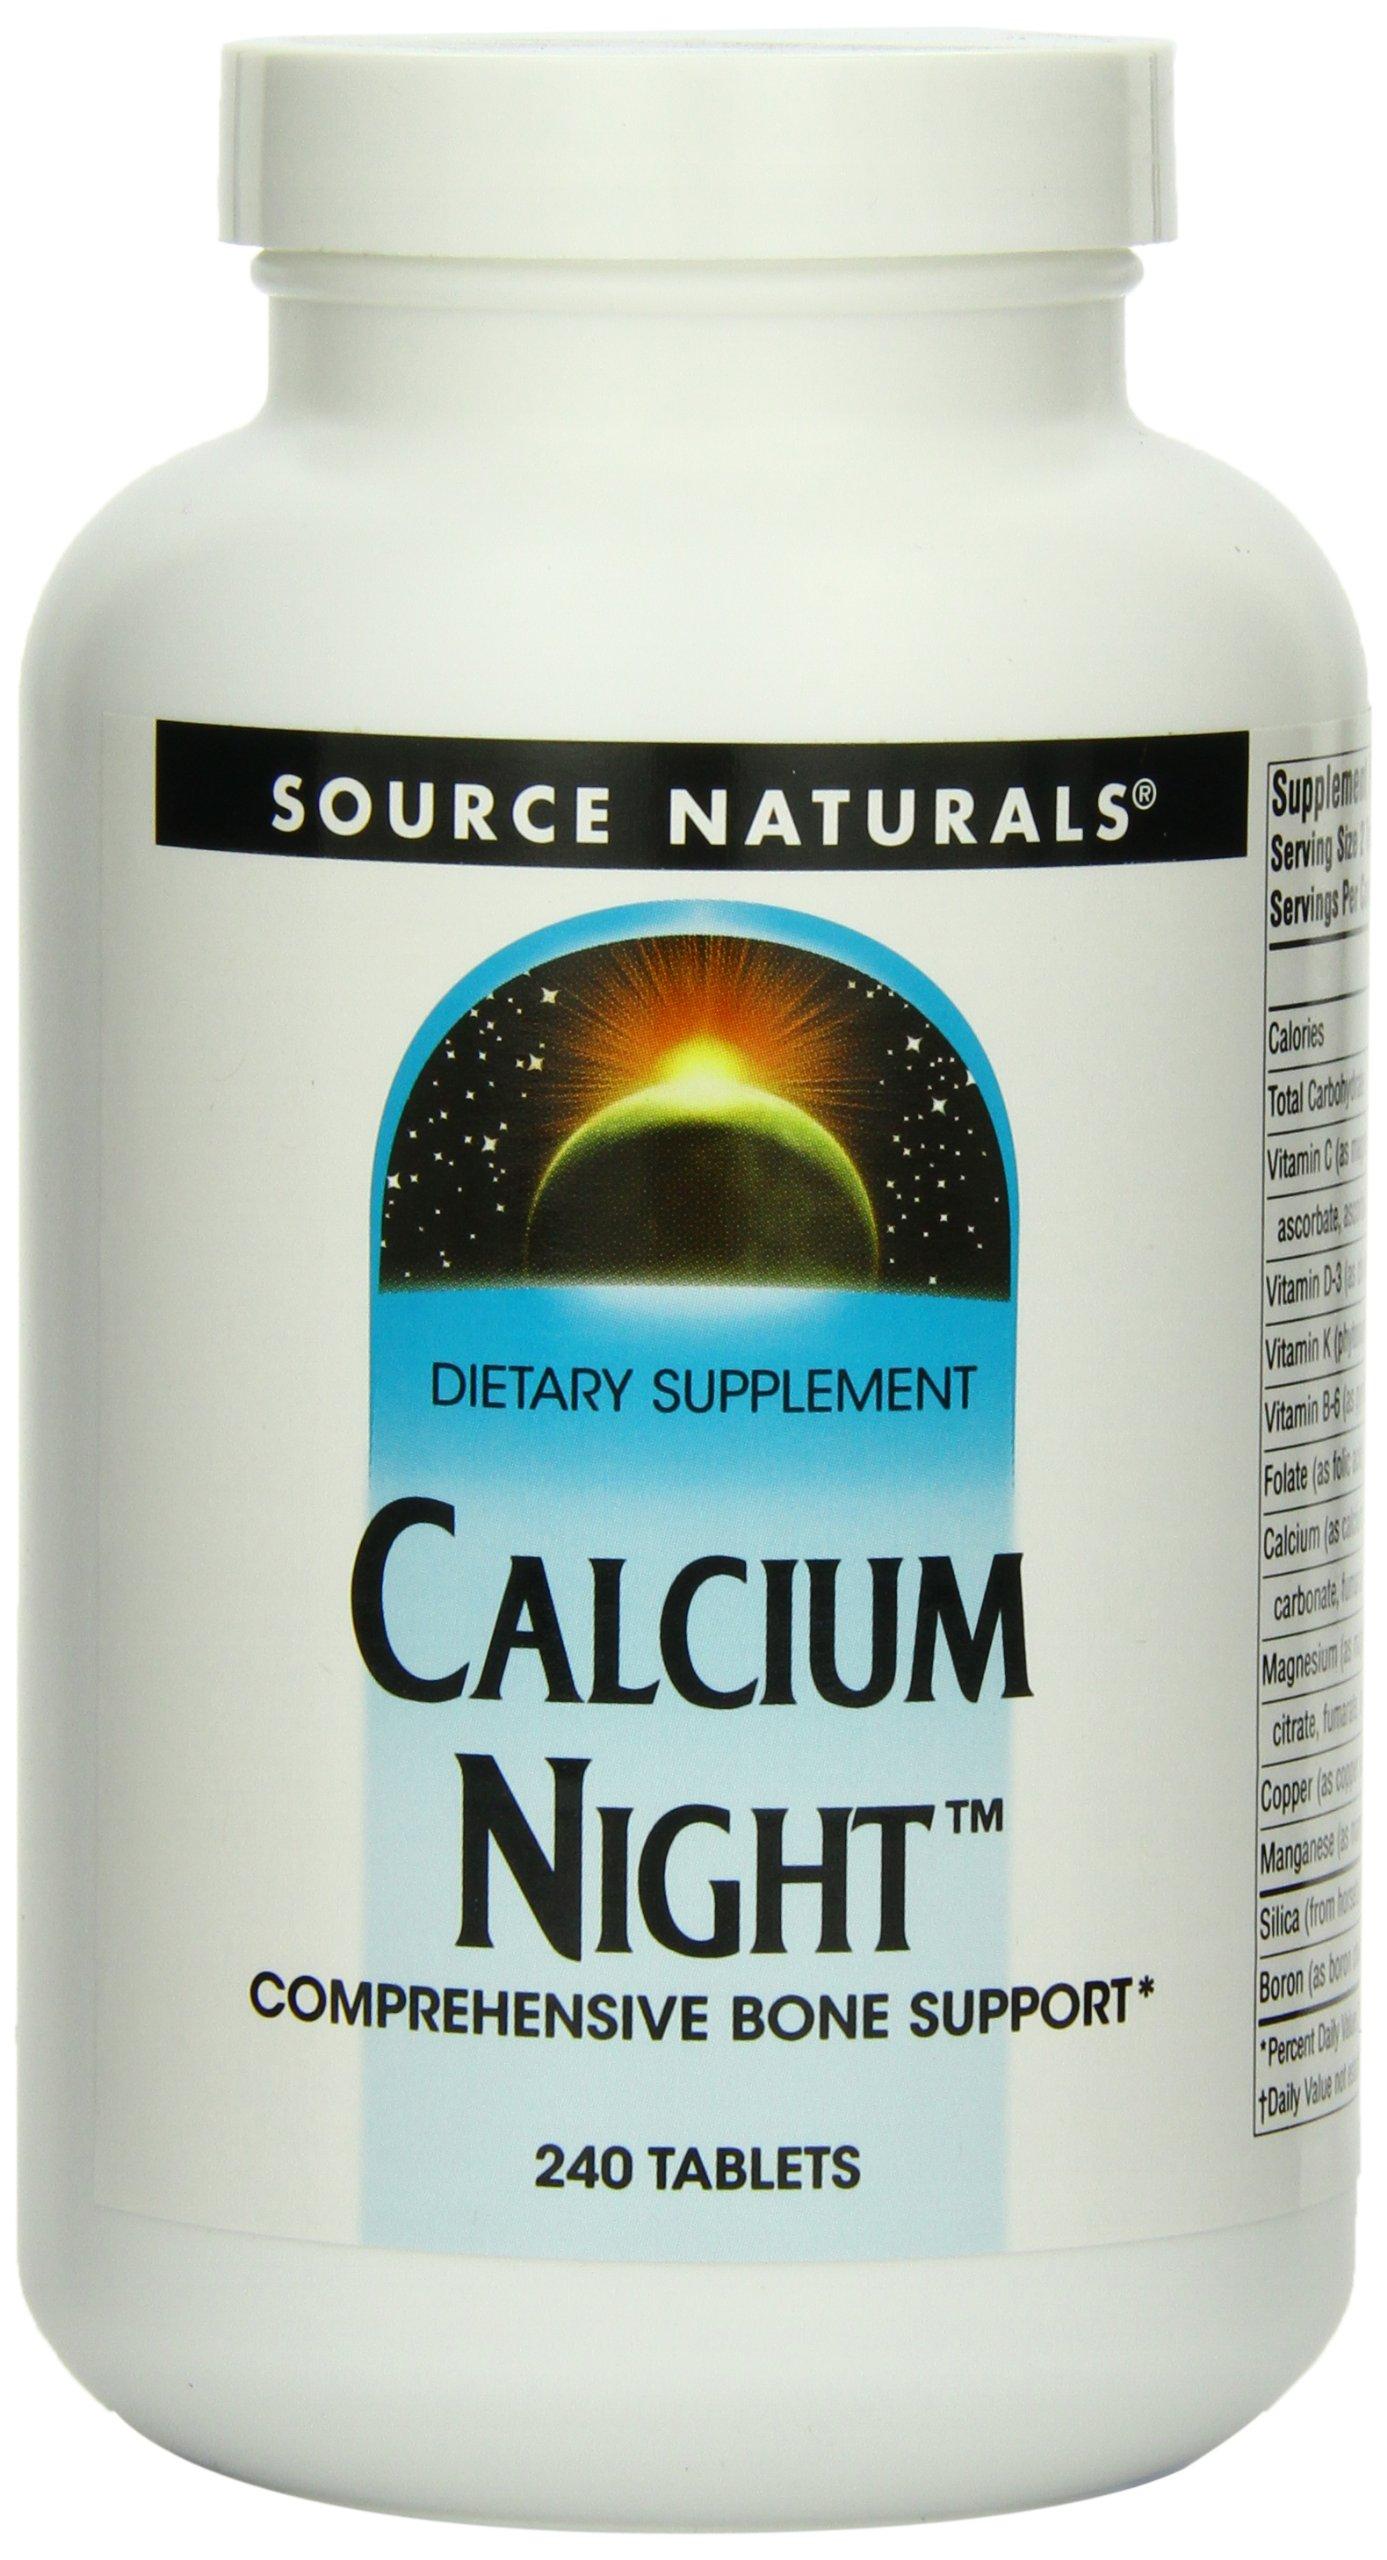 Source Naturals Calcium Night, 240 Tablets